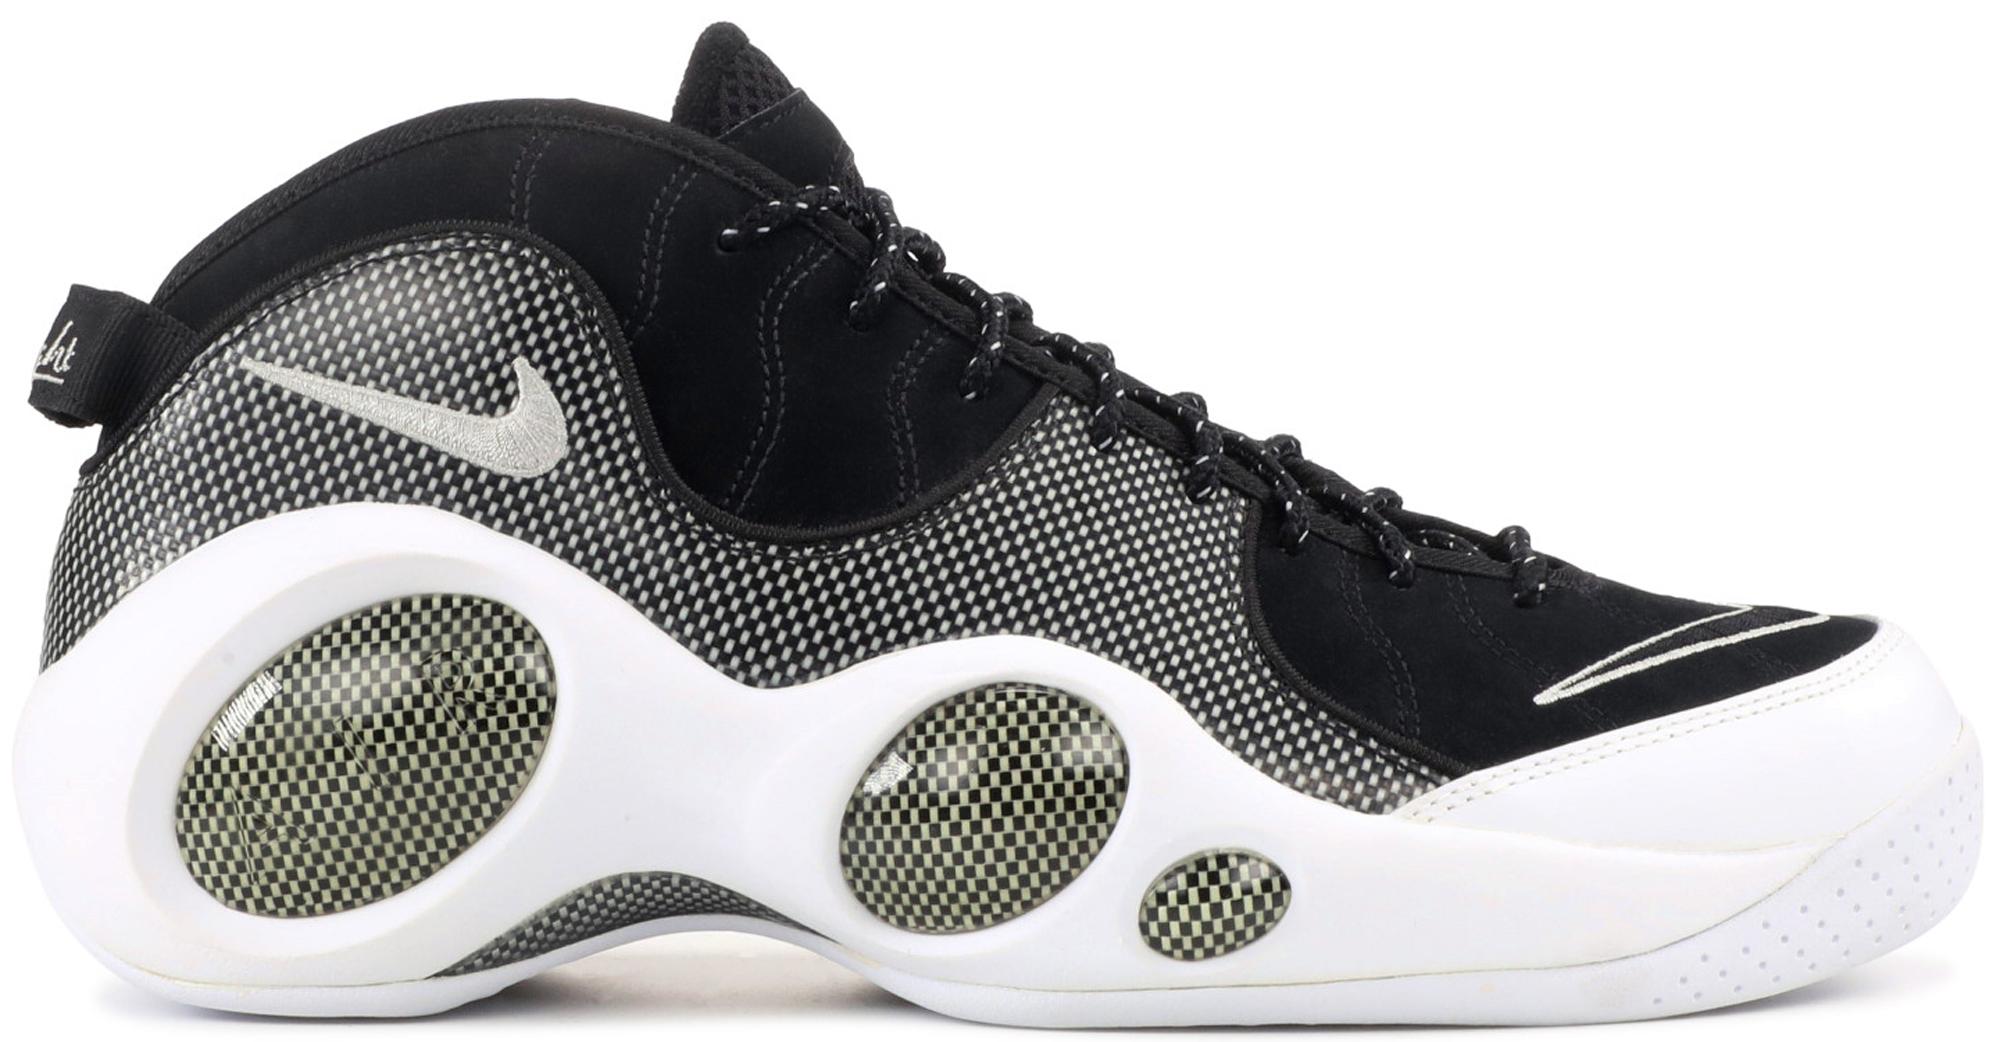 Nike Air Zoom Flight 95 Black White